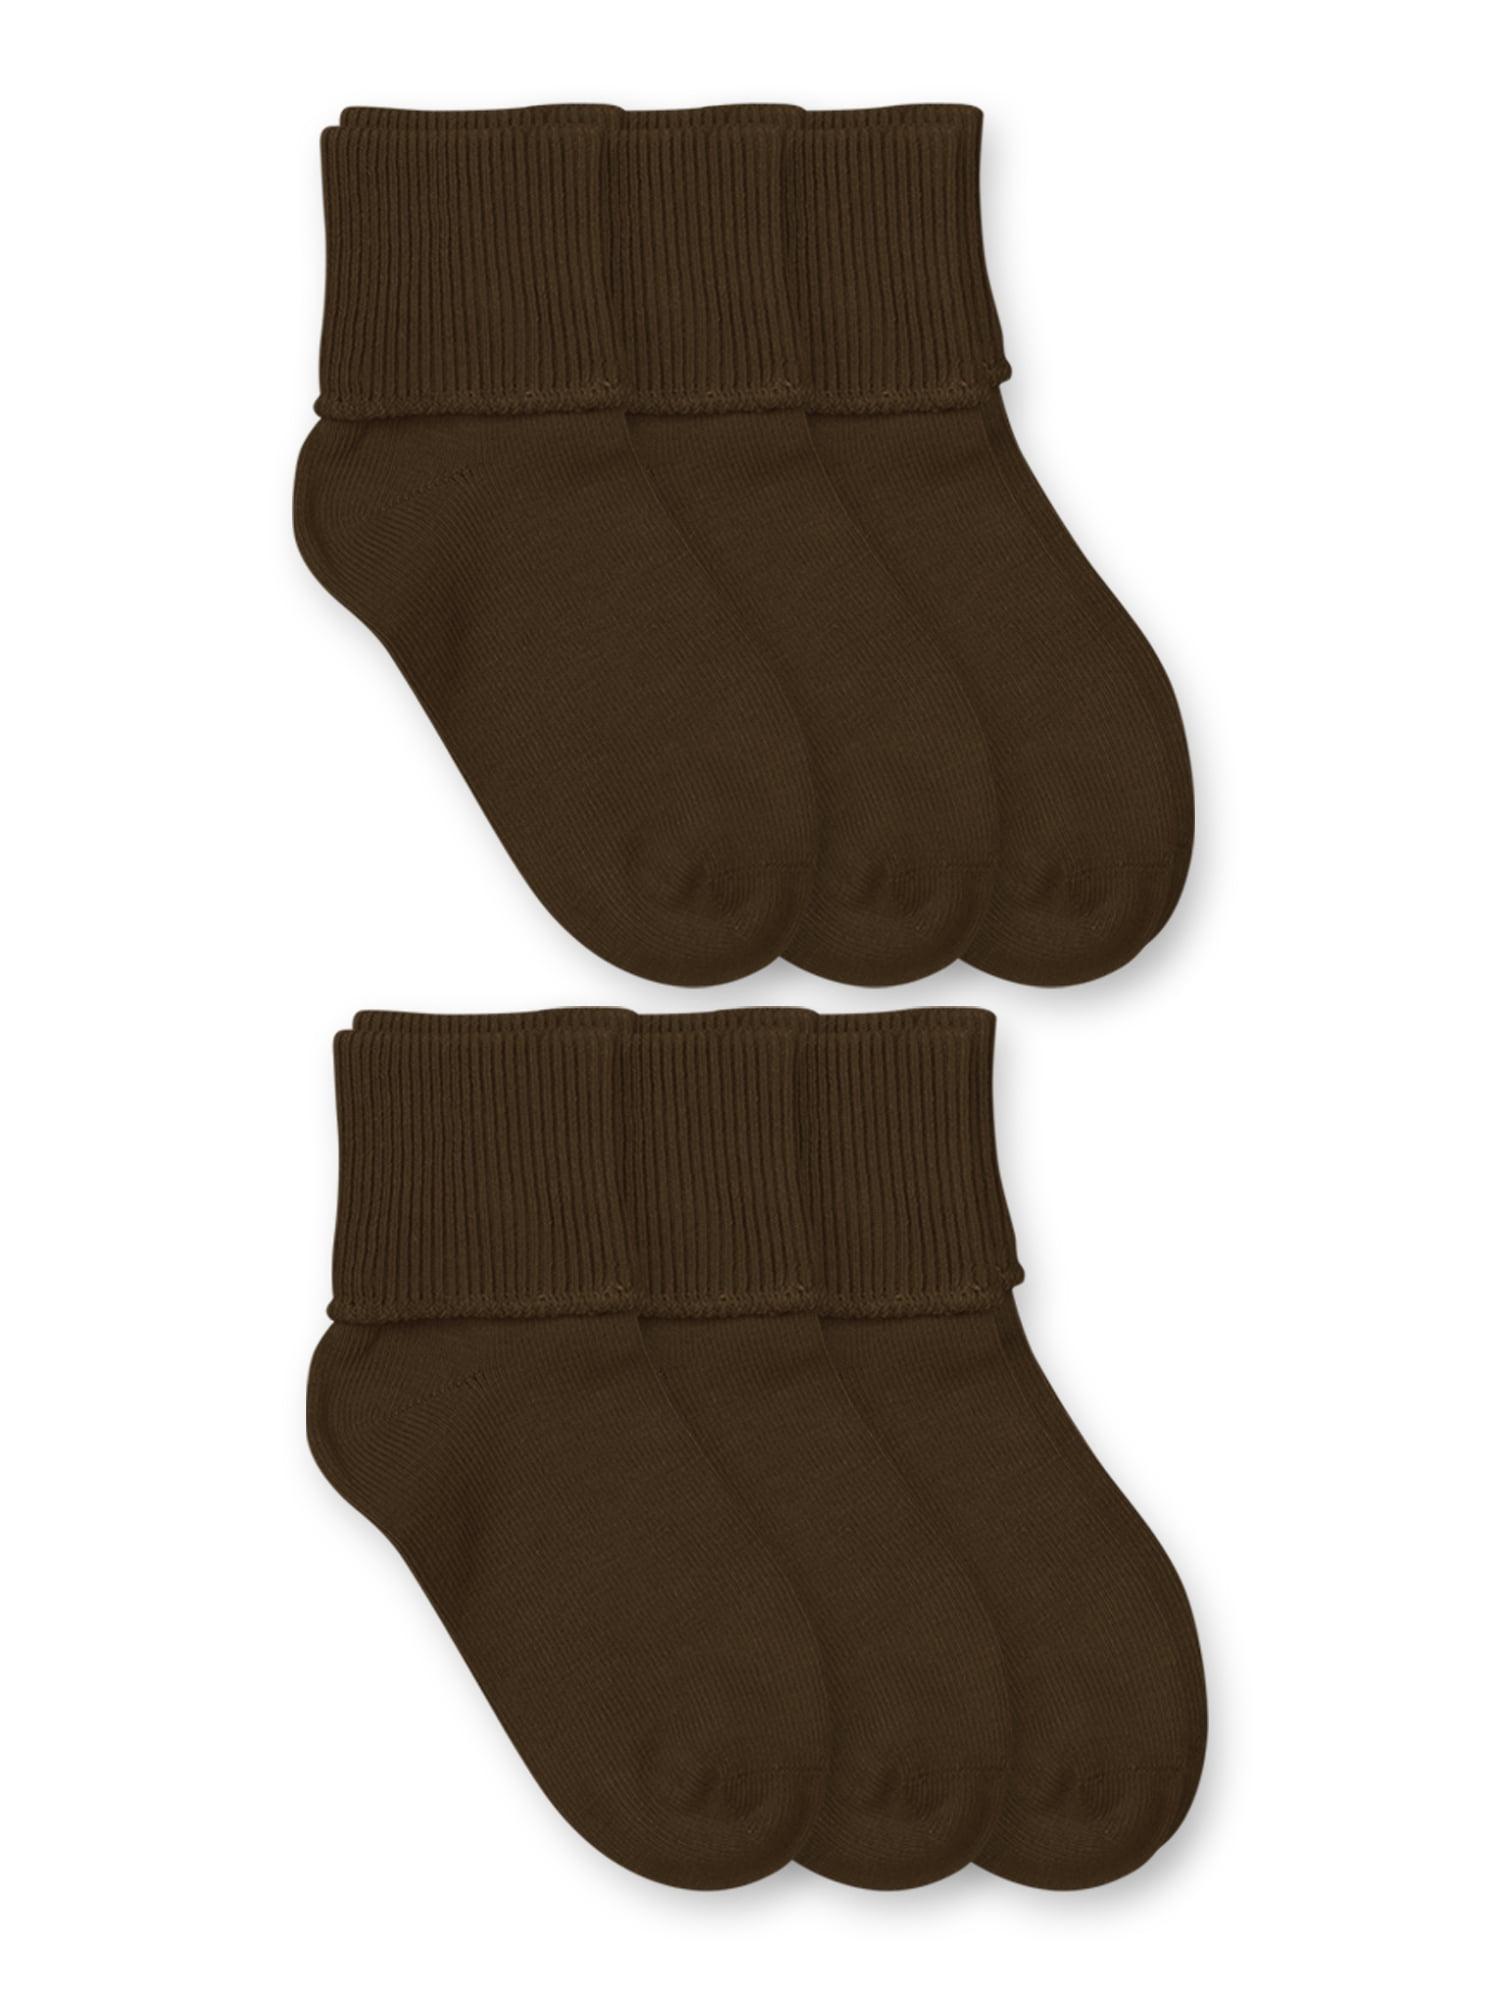 Toddler//Little Kid//Big Kid Jefferies Socks Unisex 6-Pack Organic Cotton Turn Cuff